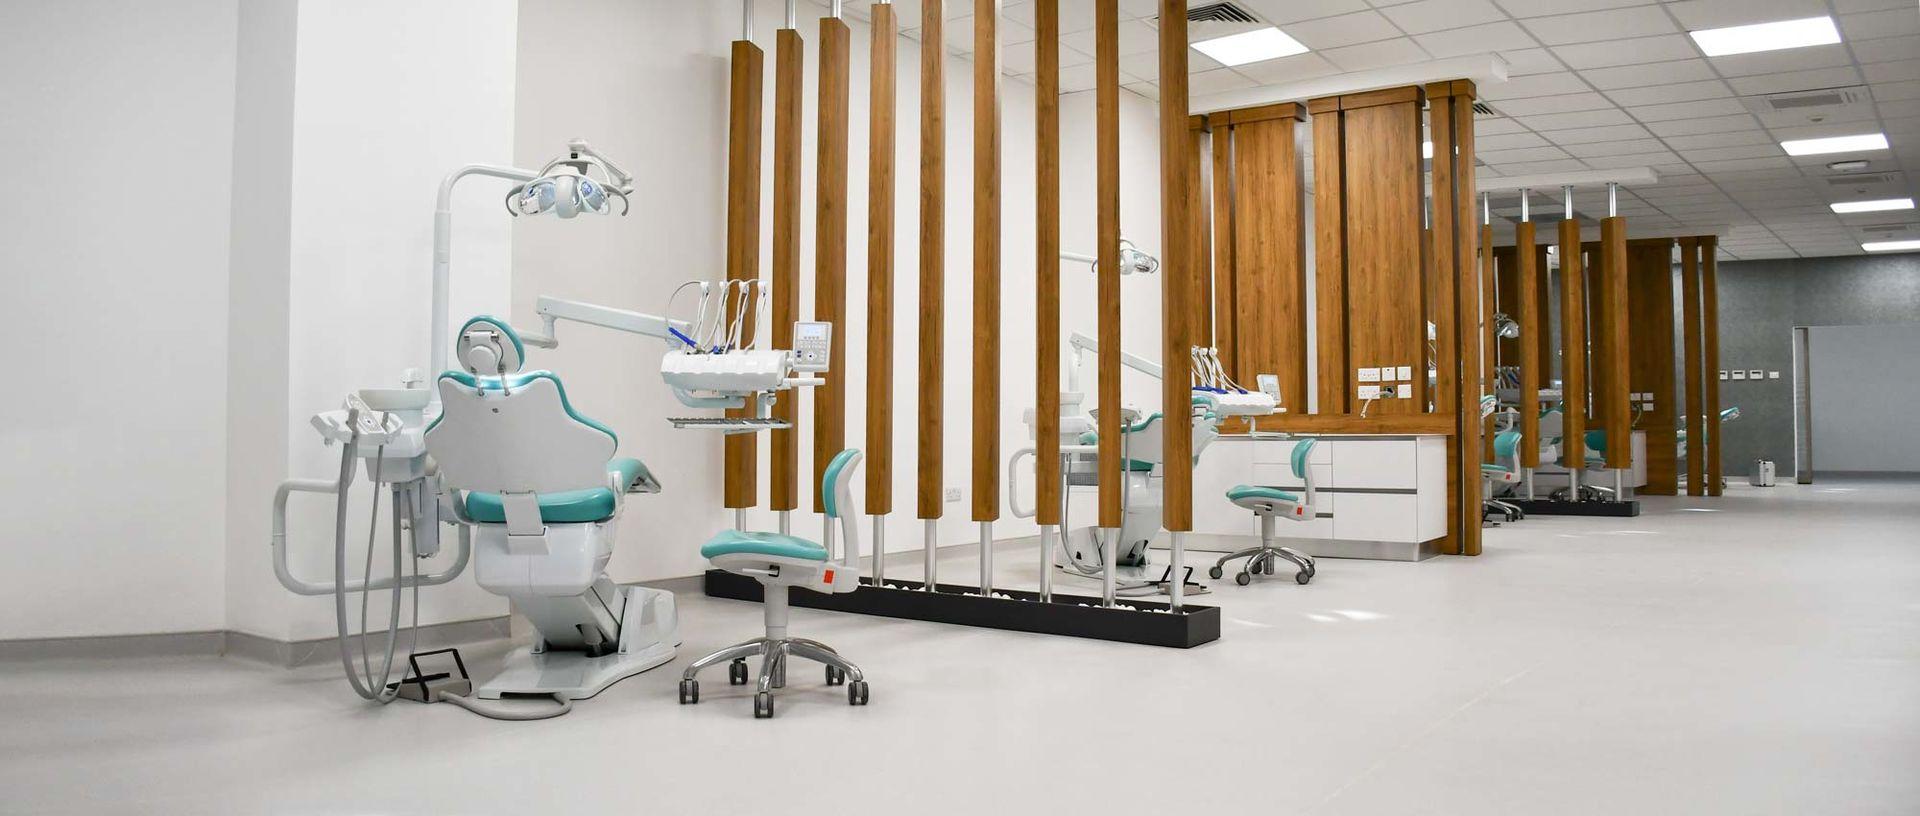 پذیرش دندانپزشکی